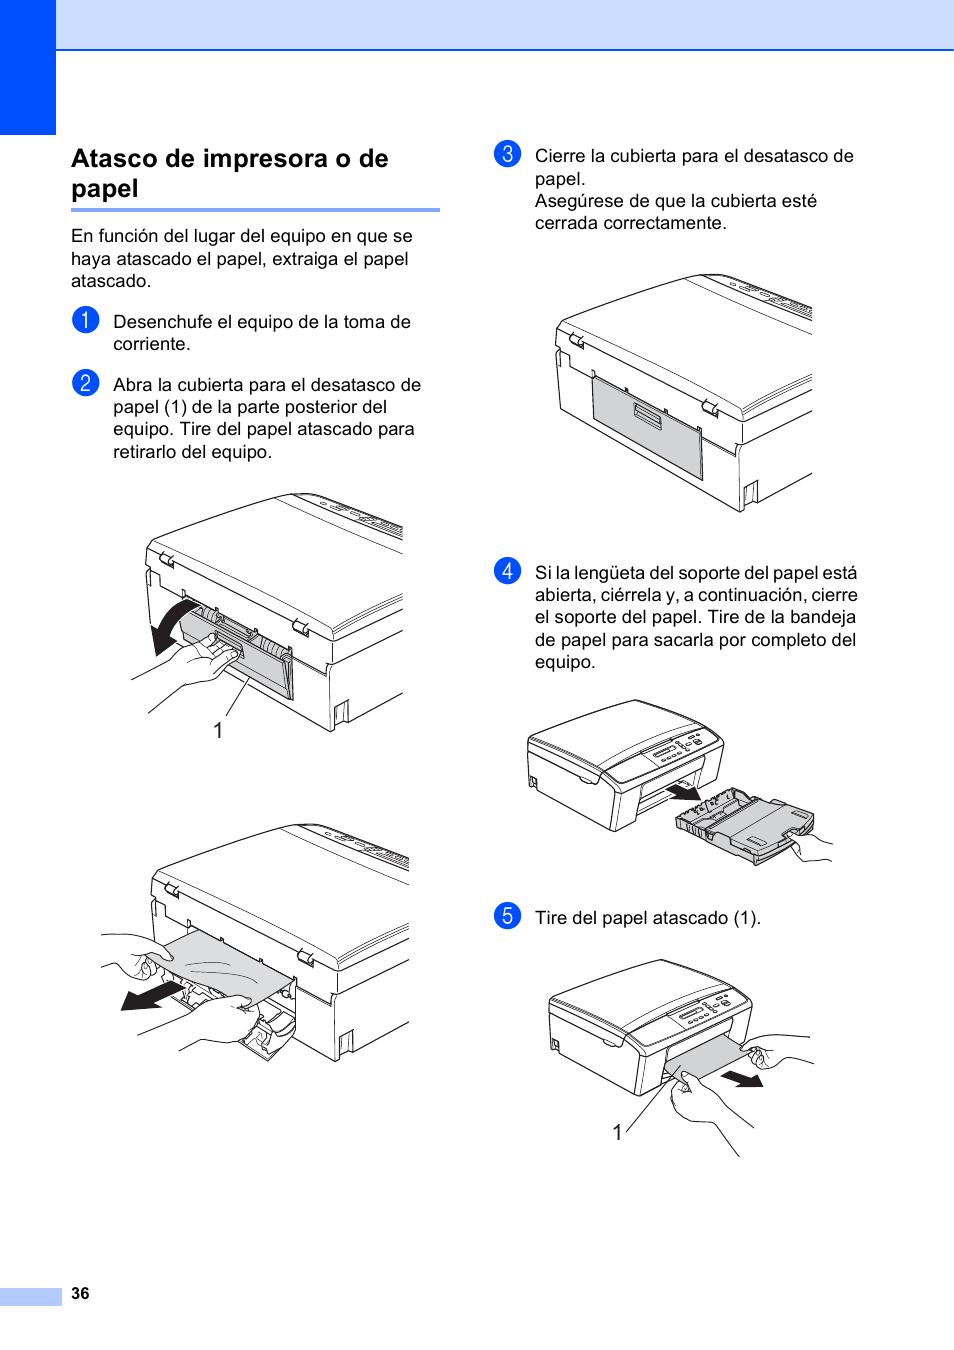 atasco de impresora o de papel brother dcp j140w manual del rh pdfmanuales com manual de impresora brother dcp-j140w